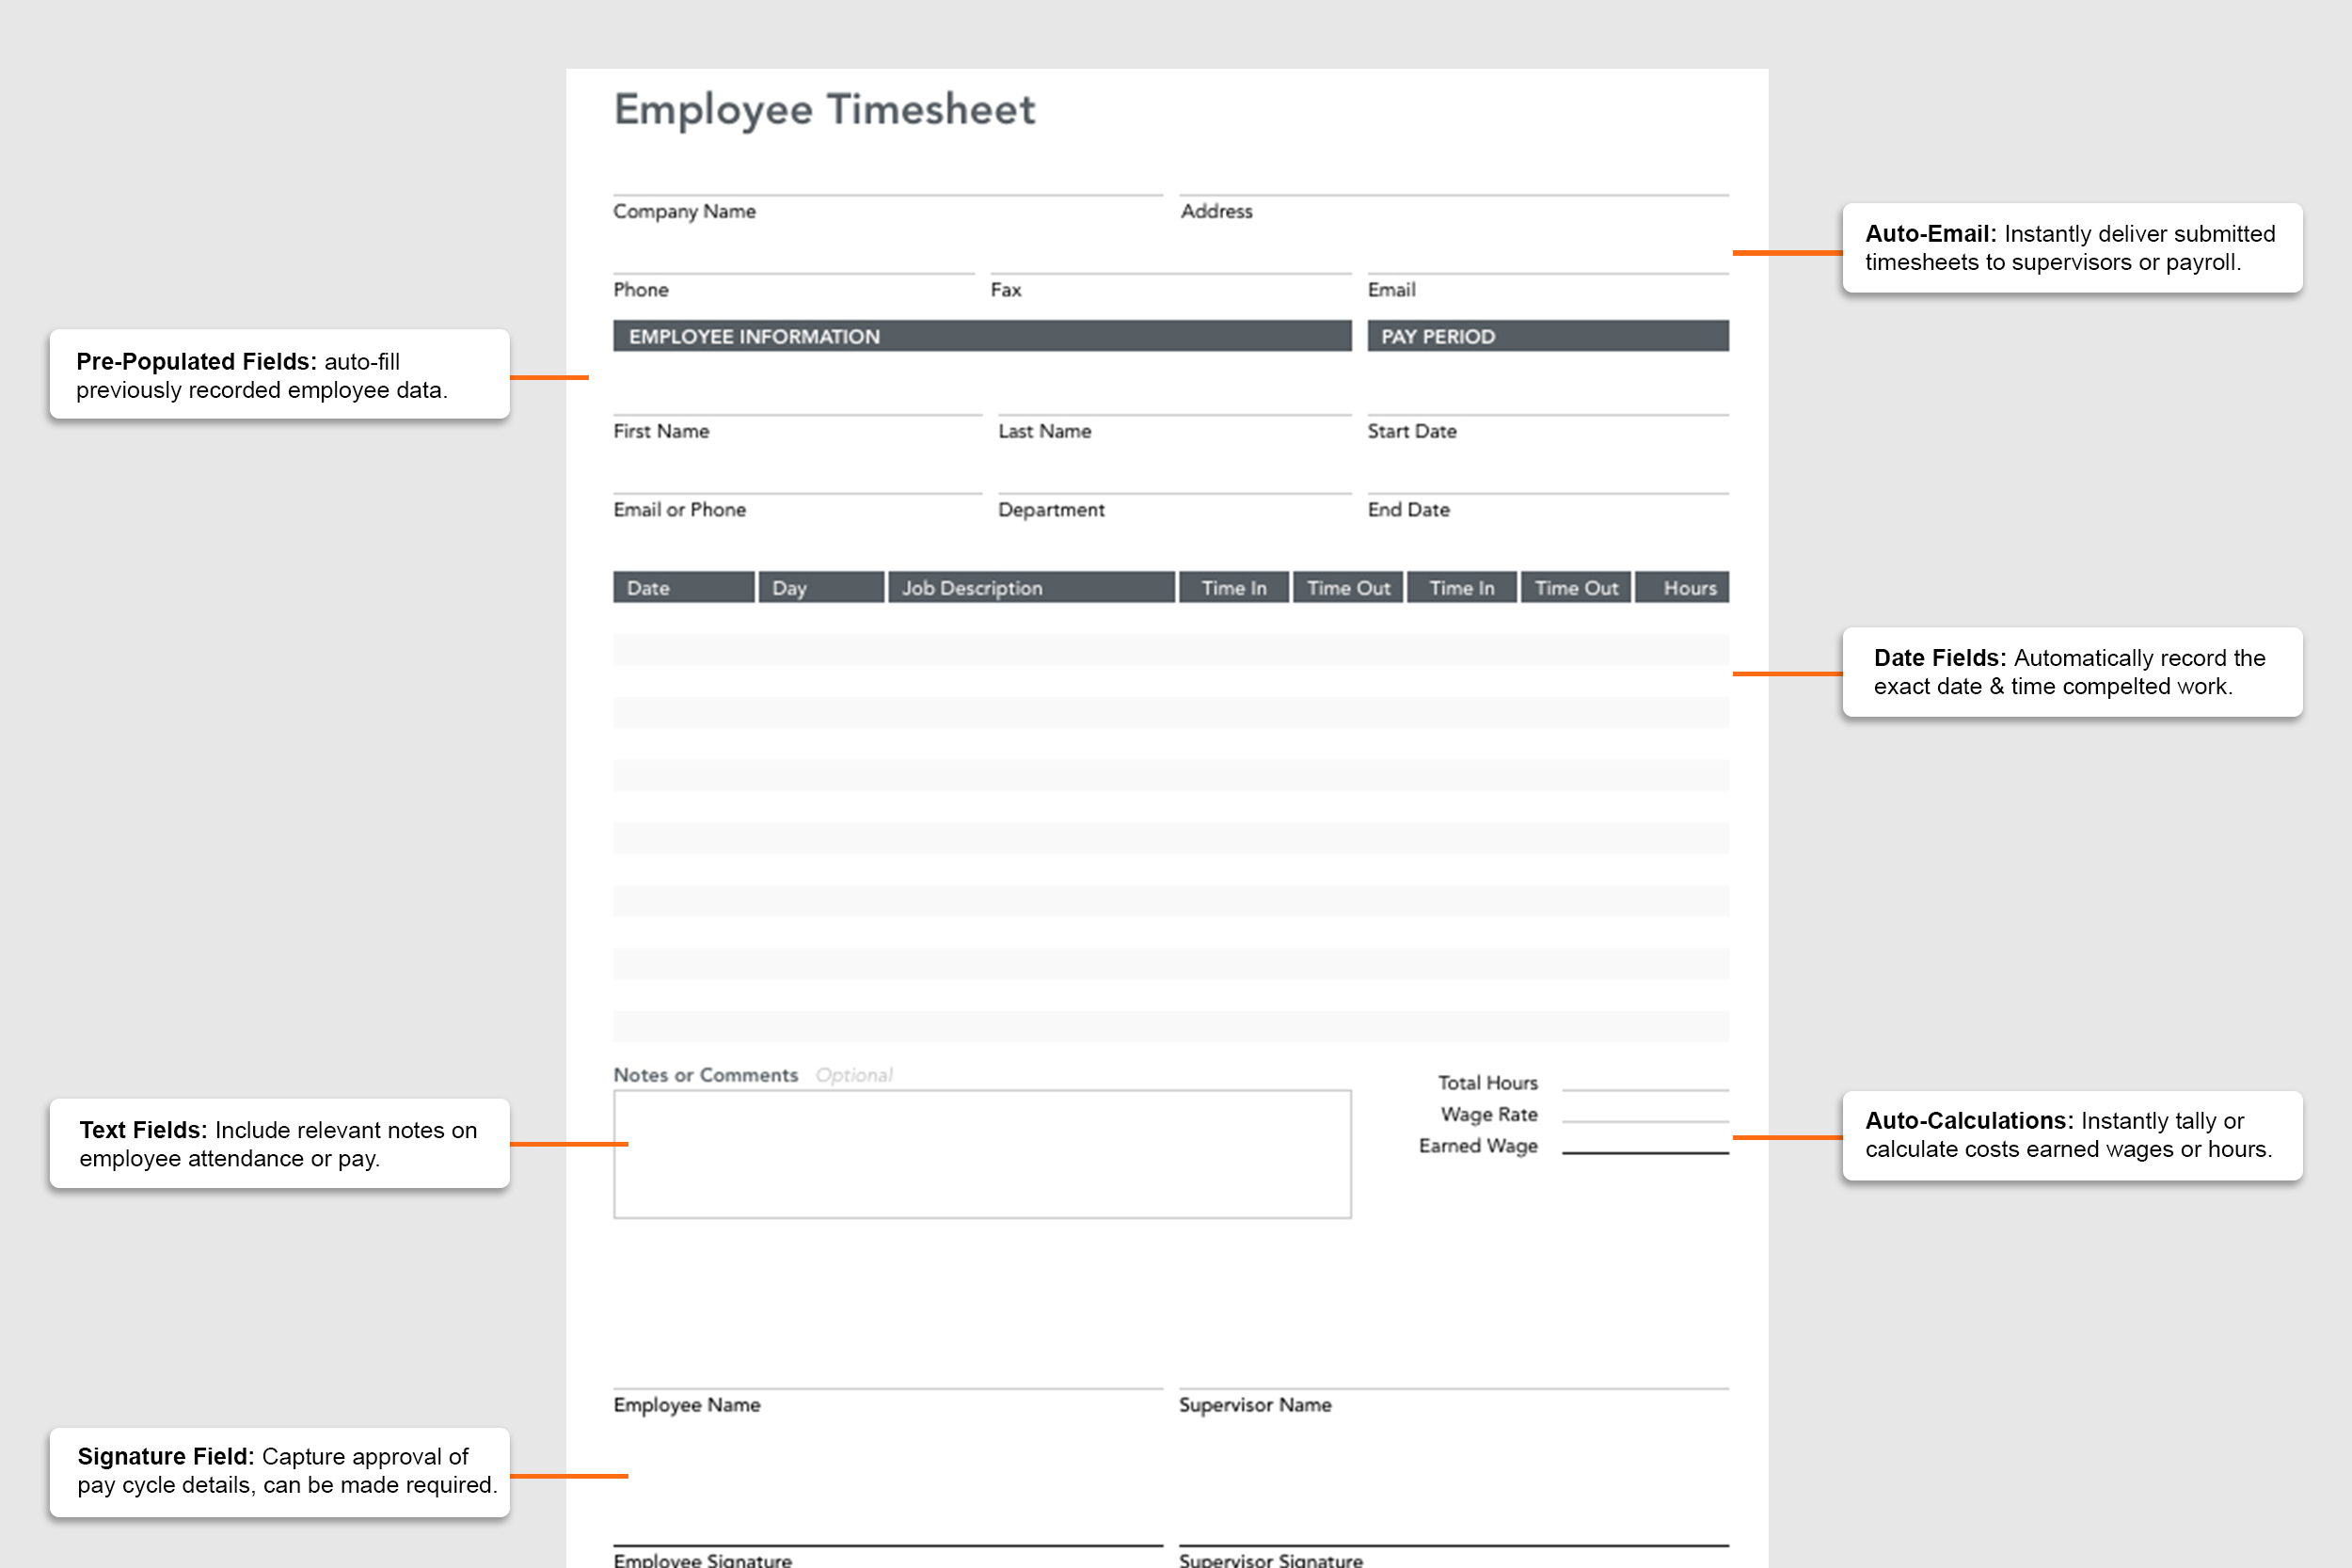 Spotlight Form The Employee Timesheet Blog GoFormz Mobile Forms